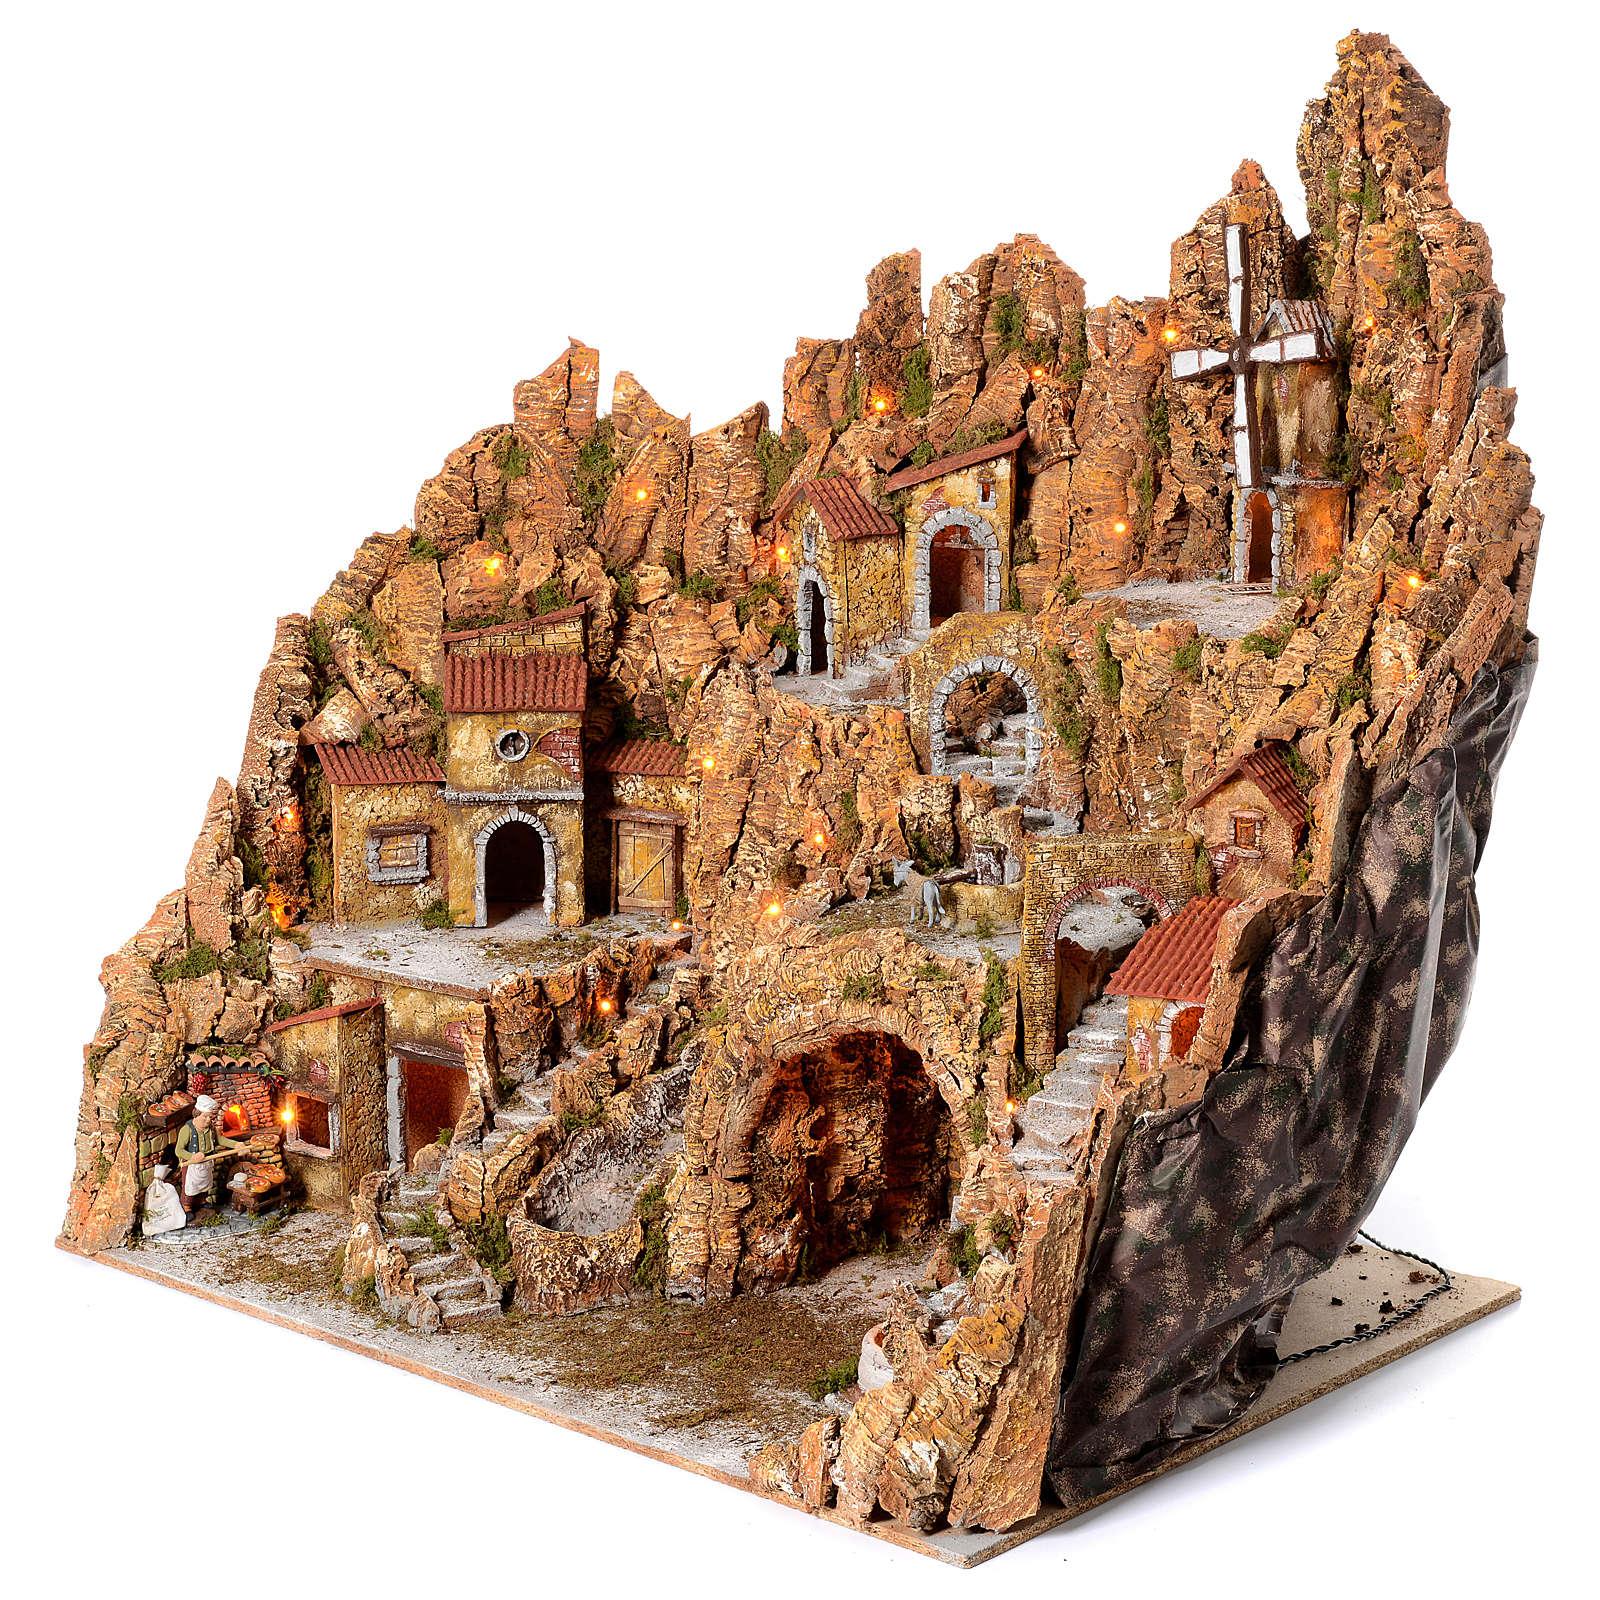 Illuminated Neapolitan nativity scene with mill hut and pizza maker moving  105X95X85 4